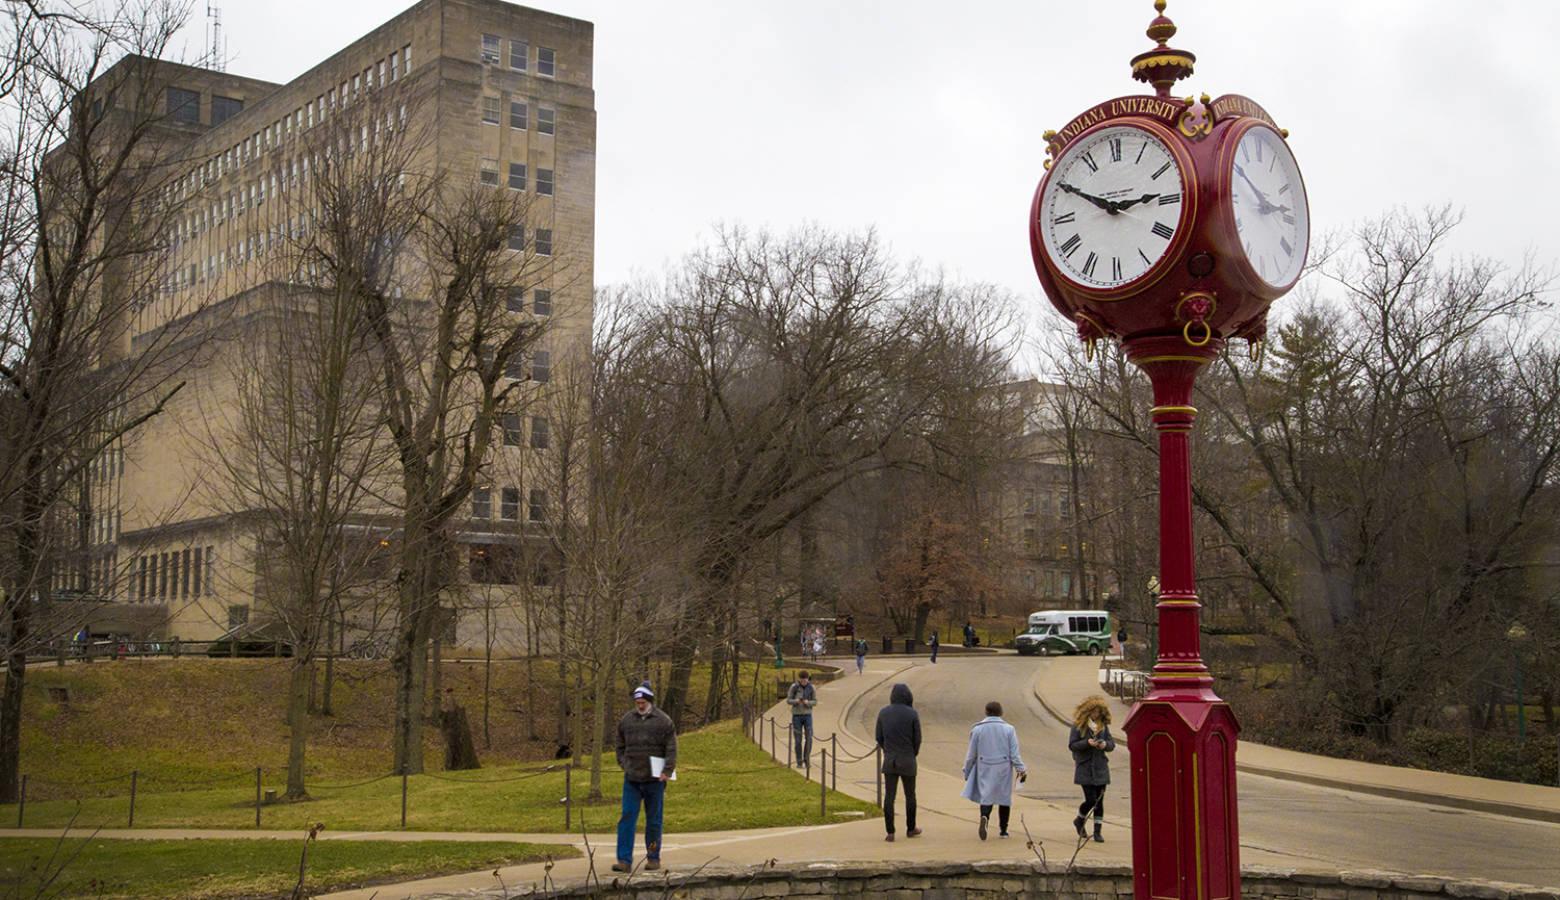 Indiana University campus in Bloomington (FILE PHOTO: Peter Balonon-Rosen/IPB News)